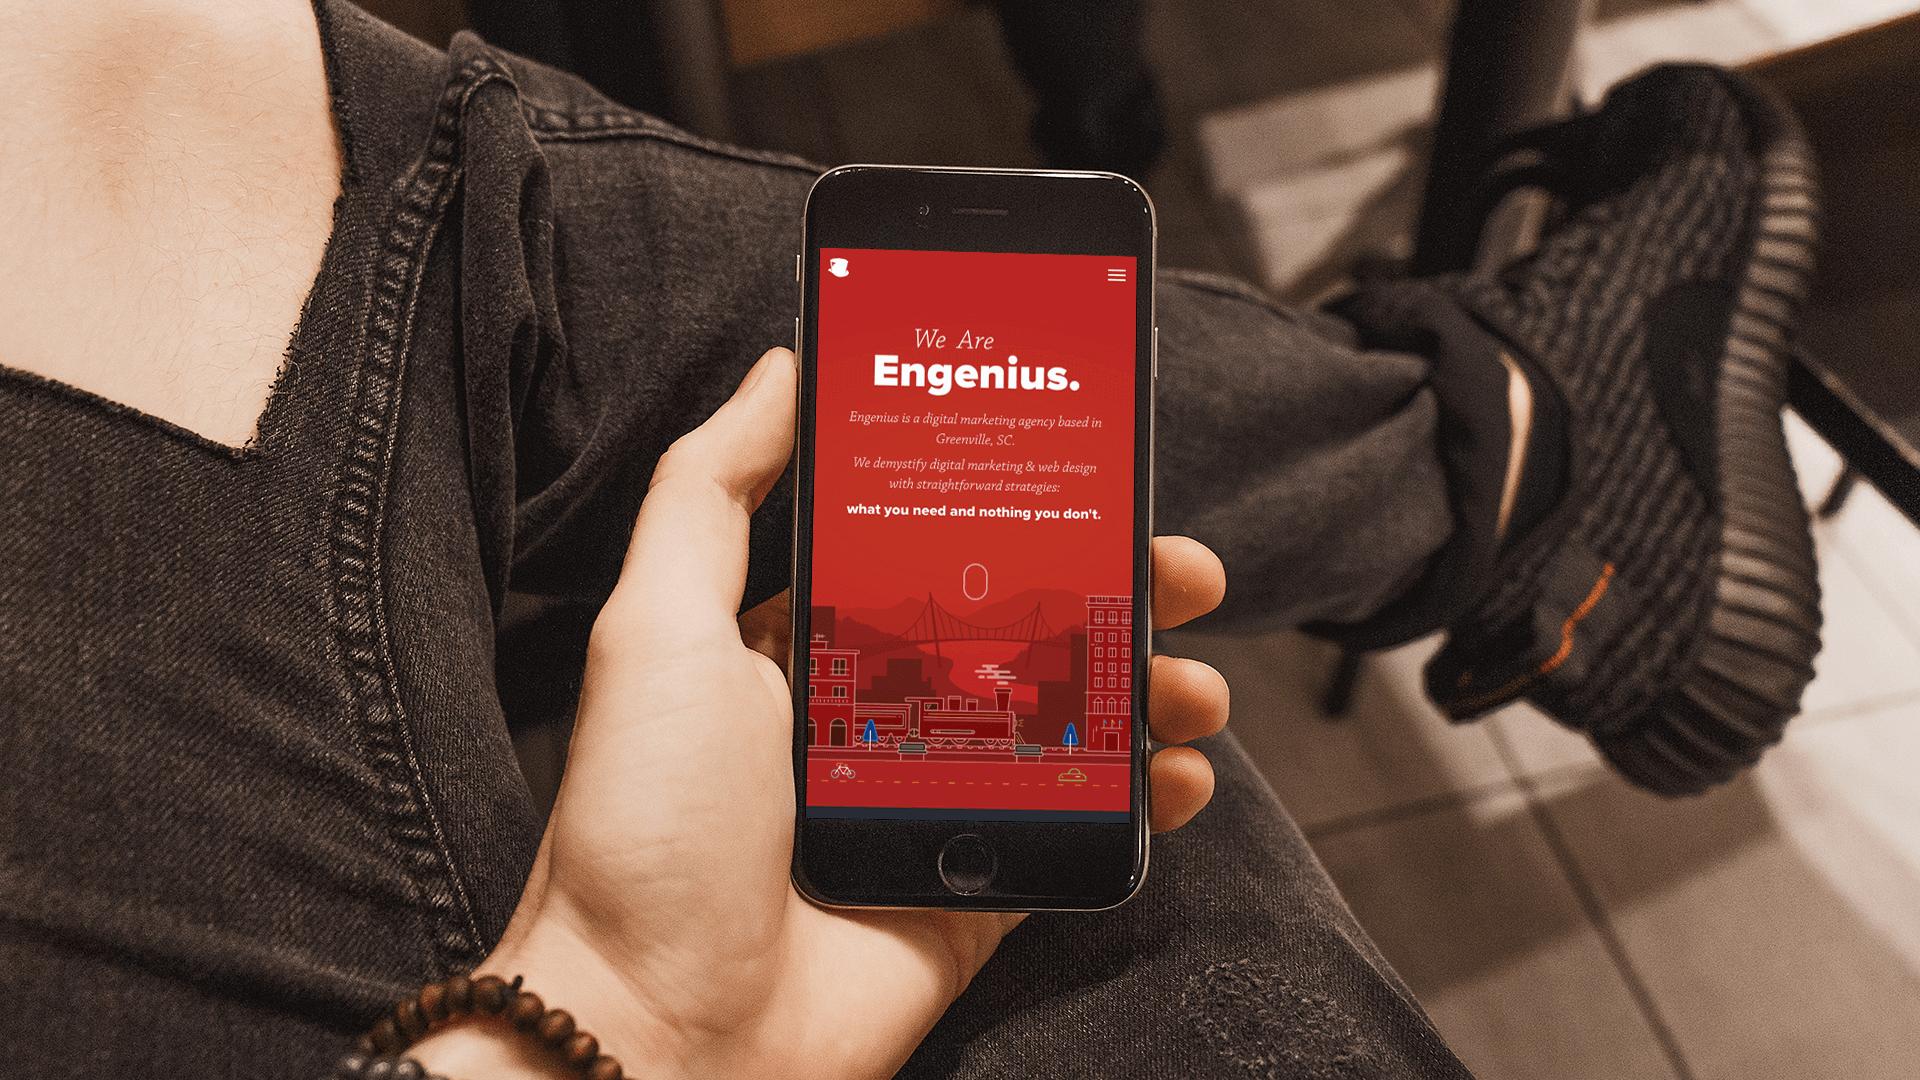 Mobile First Web Design or Journey Driven Design?